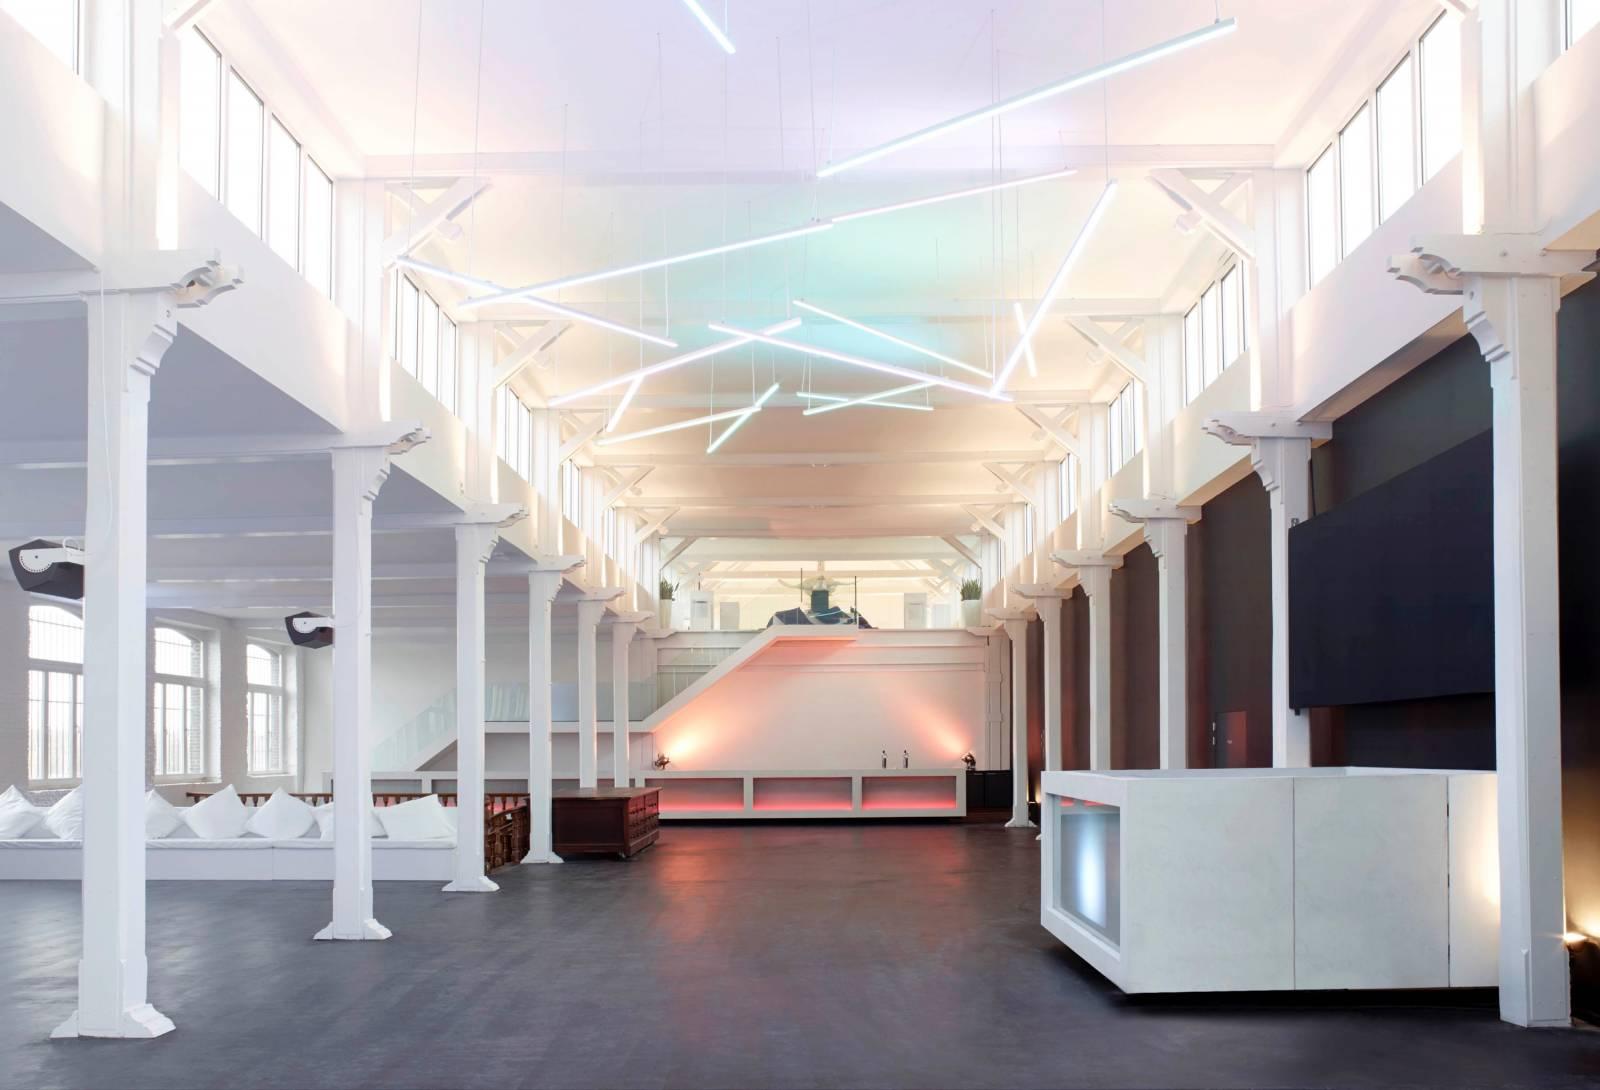 Zaal Lux - Feestzaal -  House of Weddings - 32